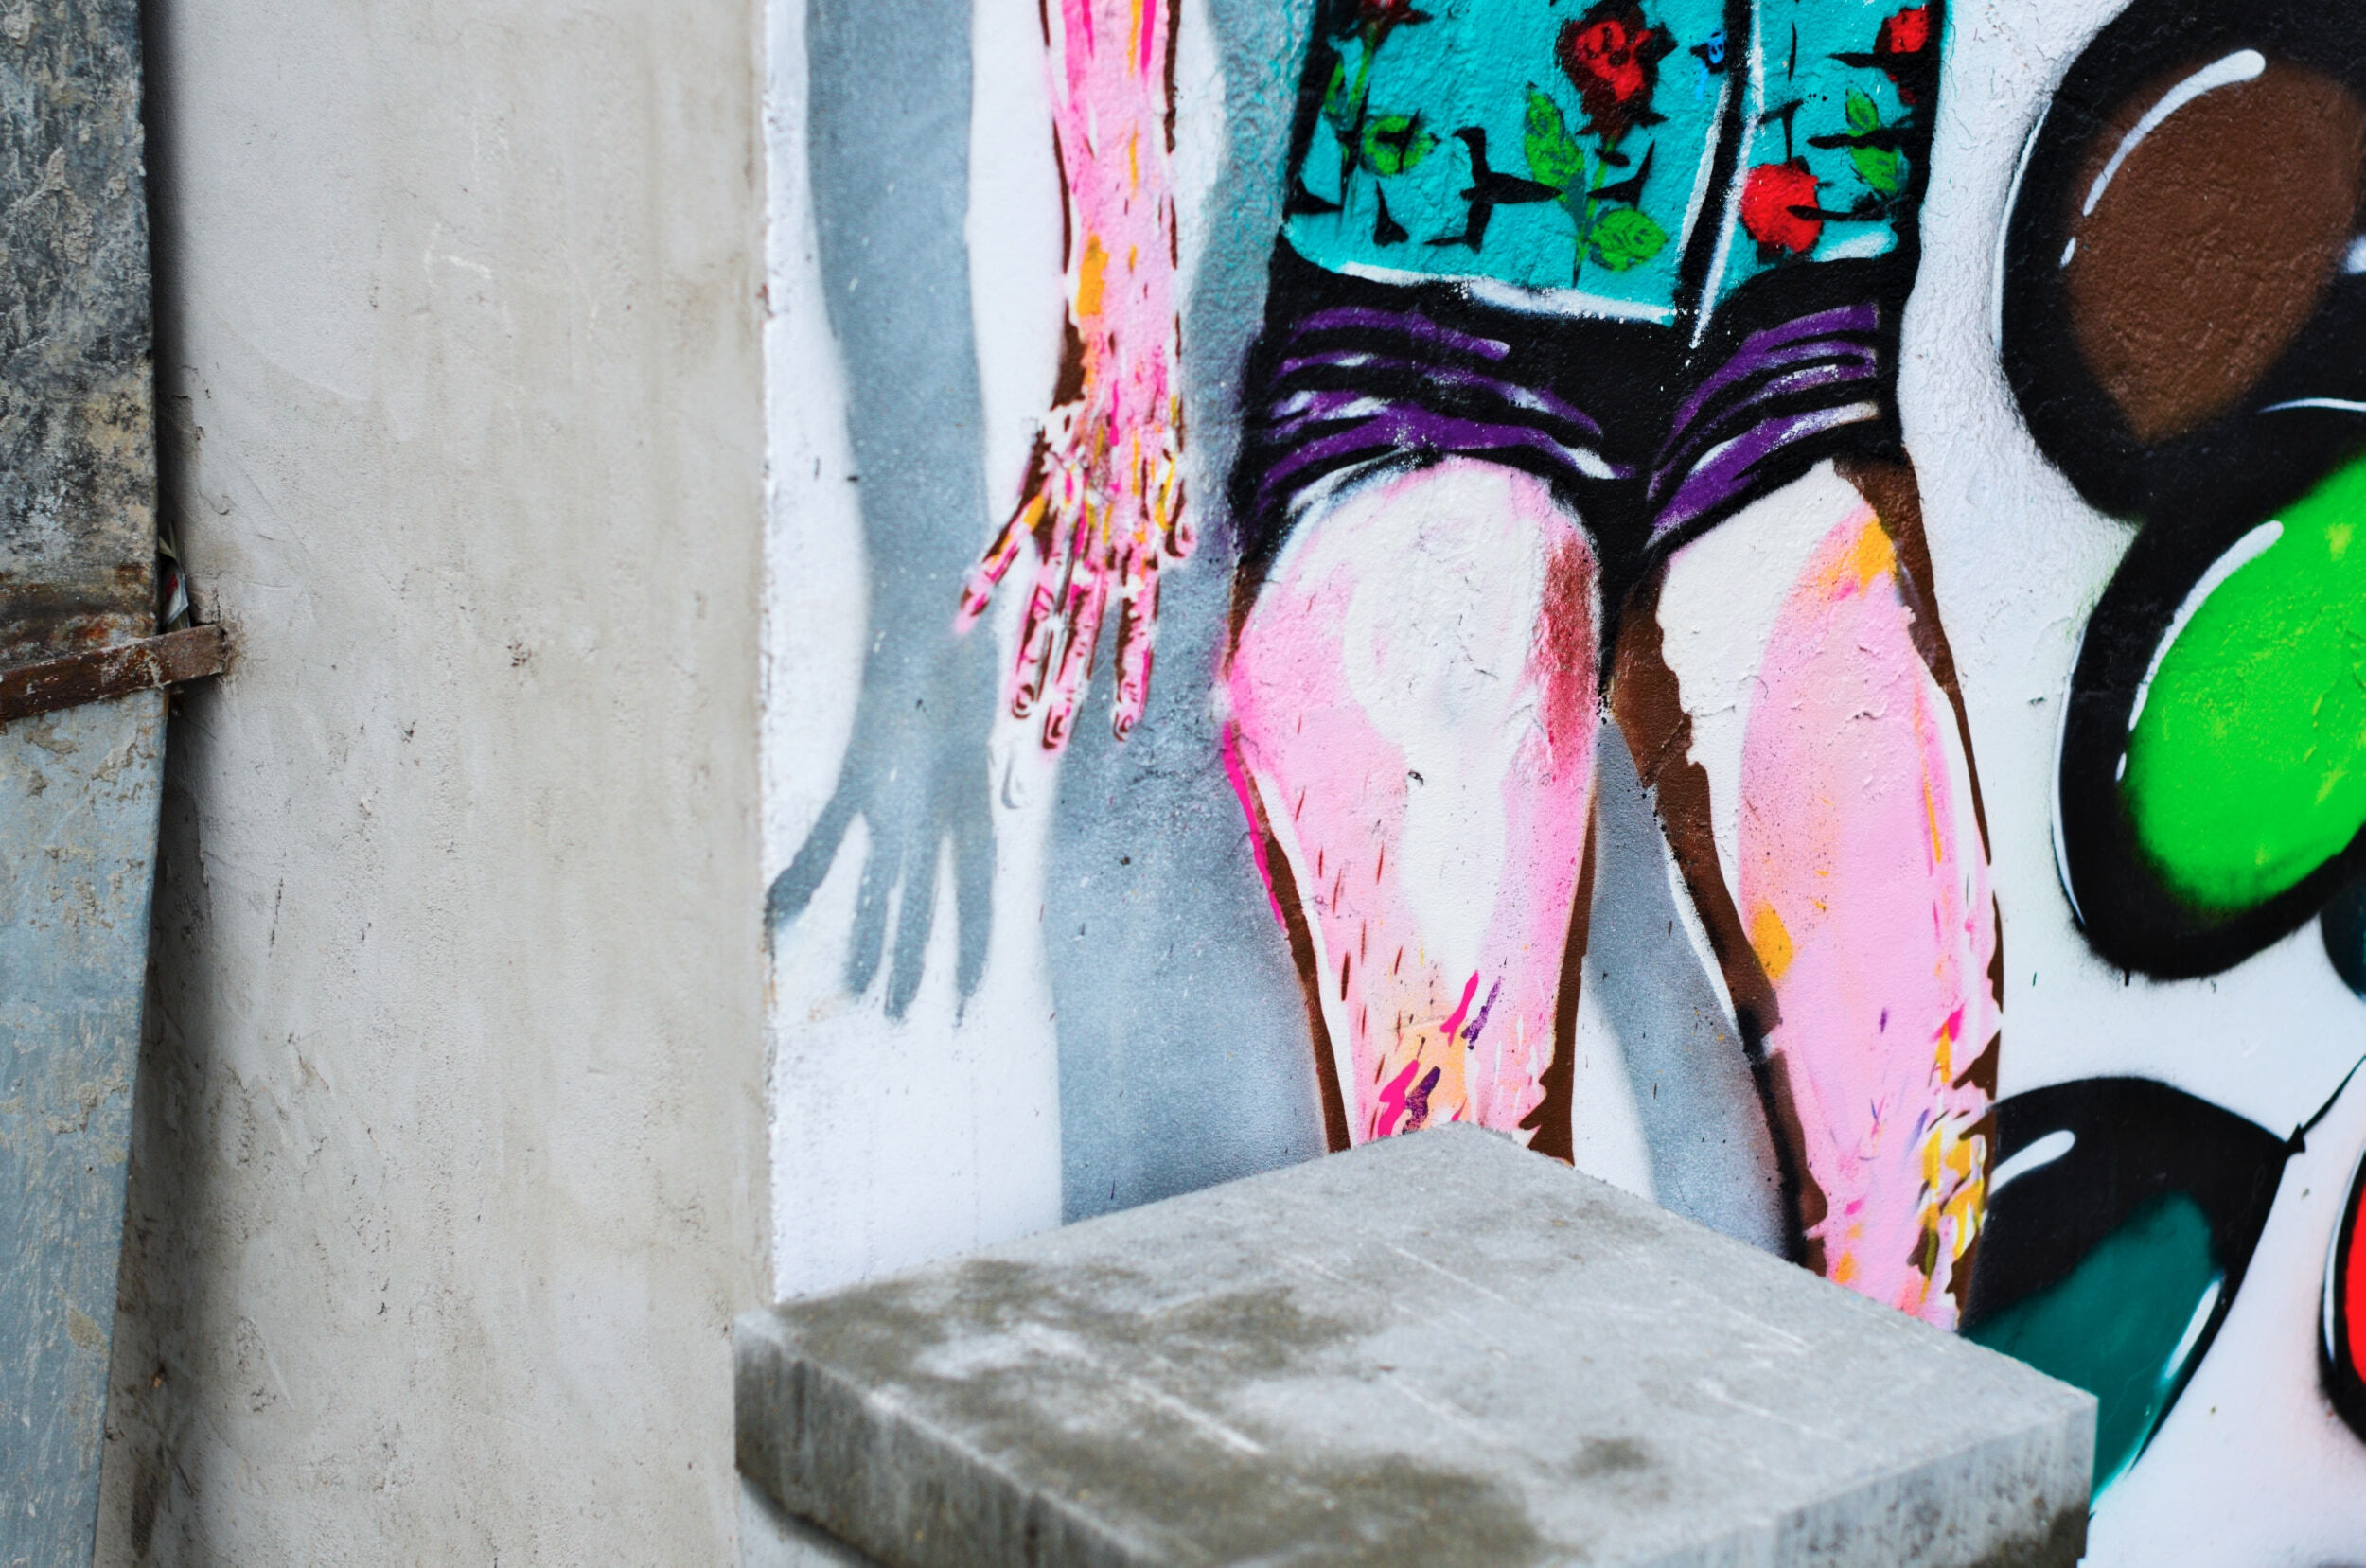 Balionai - gatvės menas - Vilmantas Ramonas